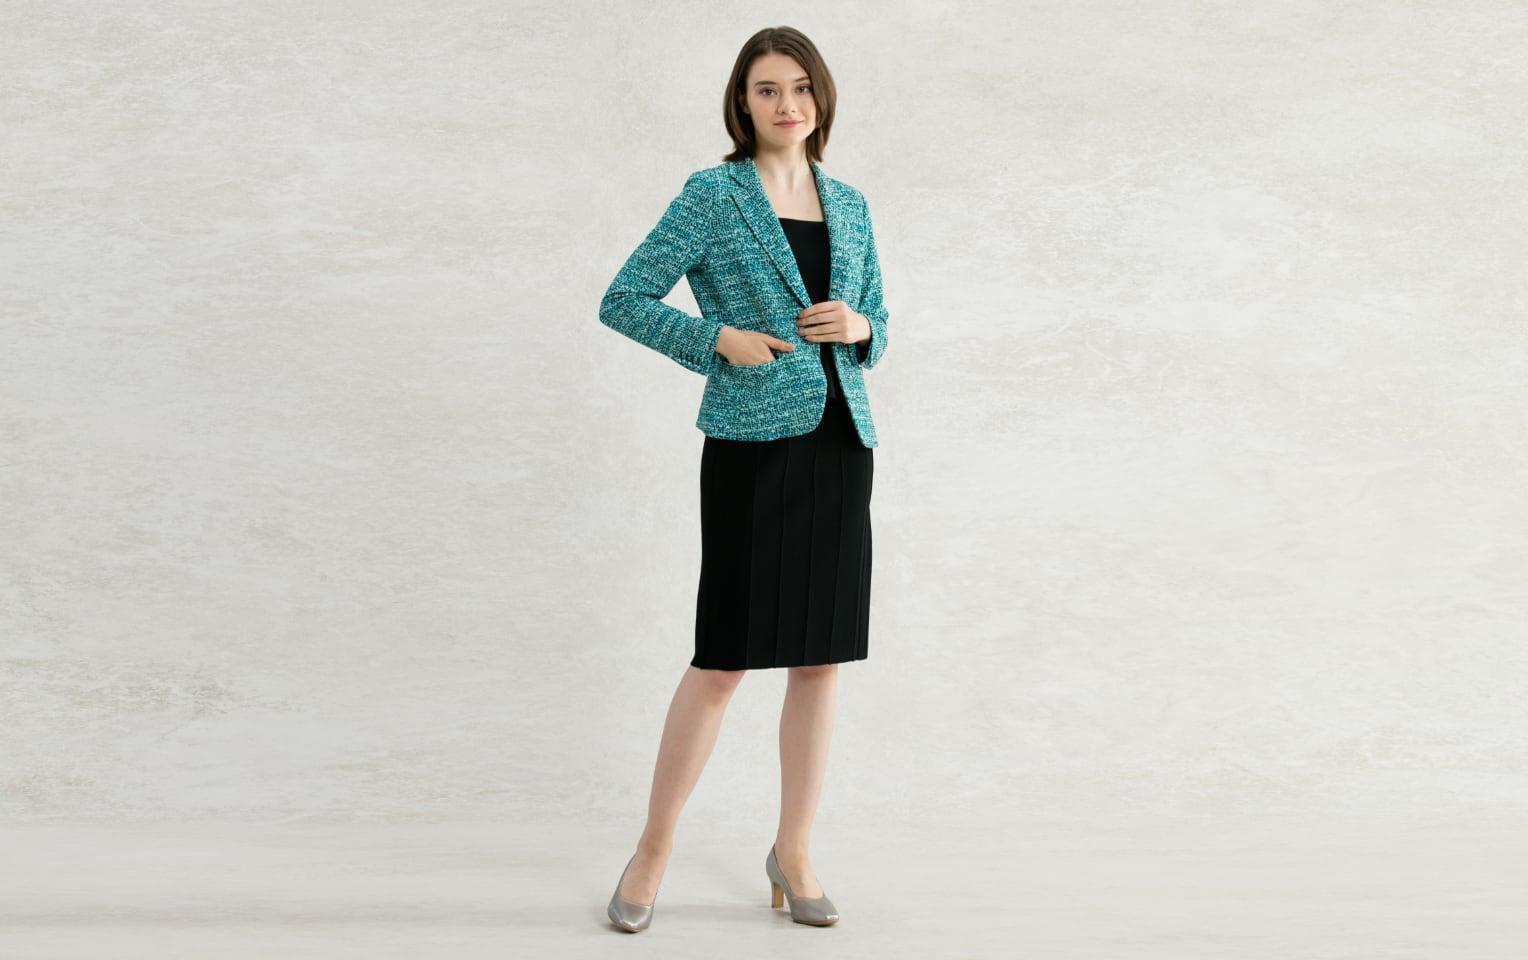 13_Coordinate_Turquoise_Twee_Tailored_Jacket.jpg